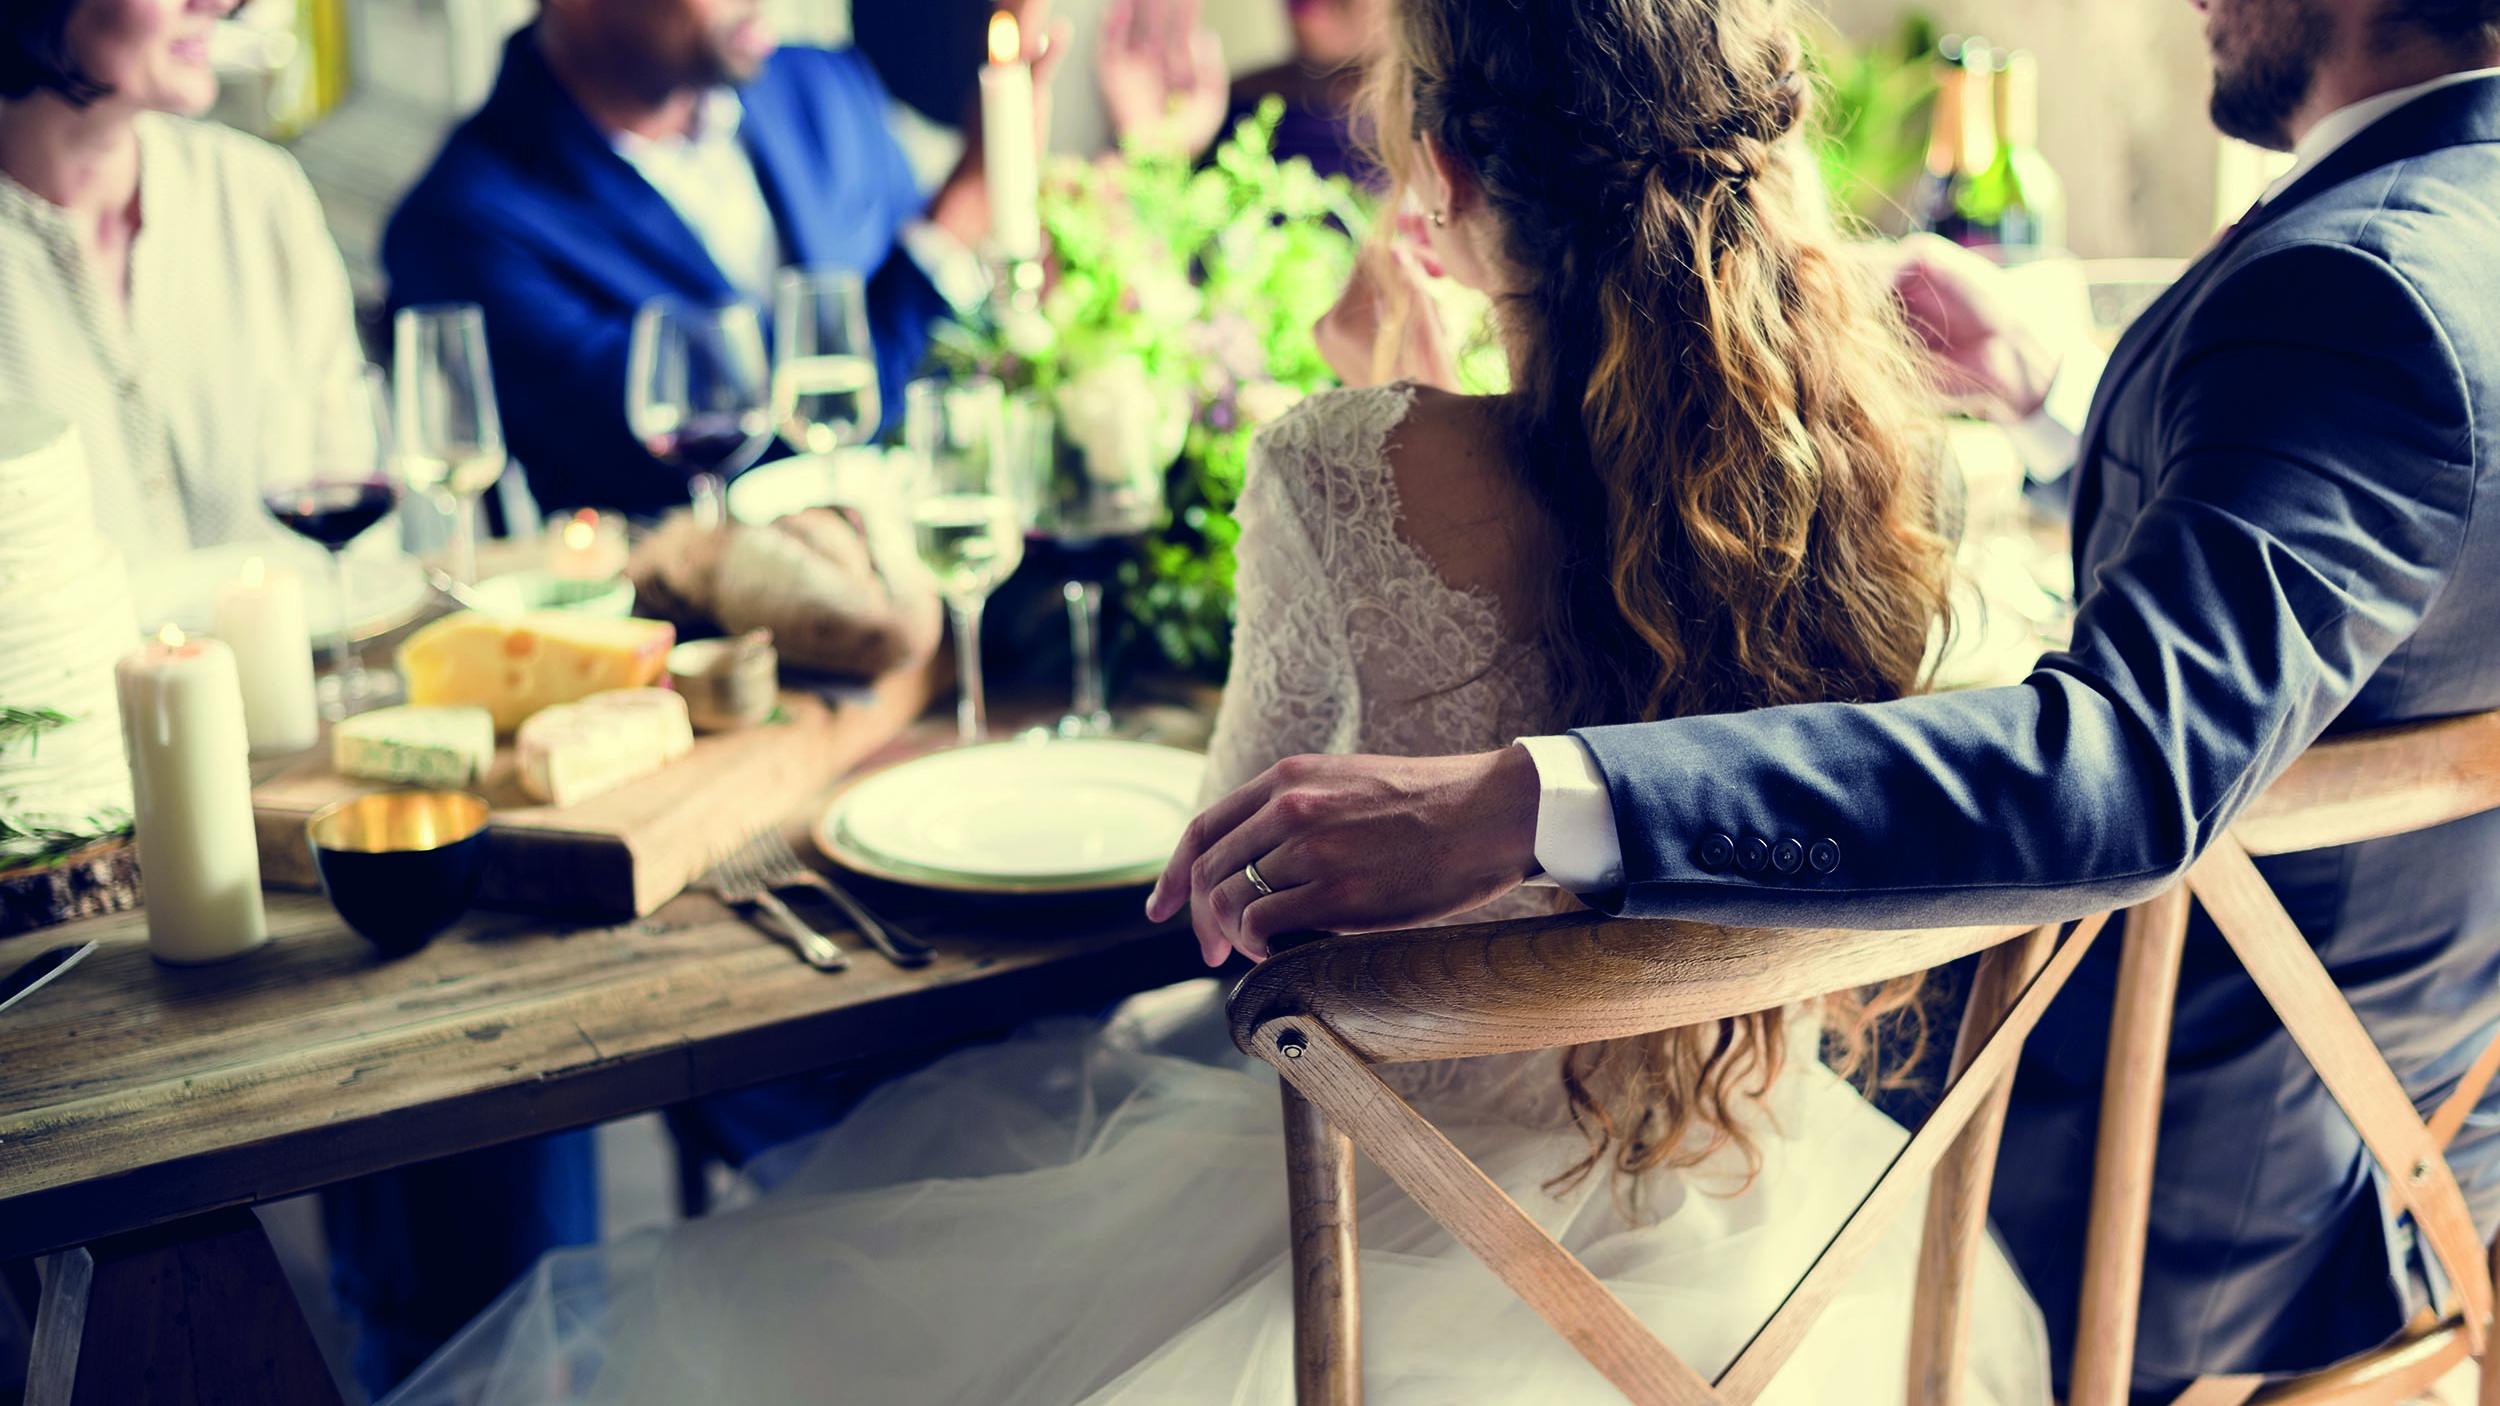 Wedding Venue in Henley-on-Thames at Badgemore Park